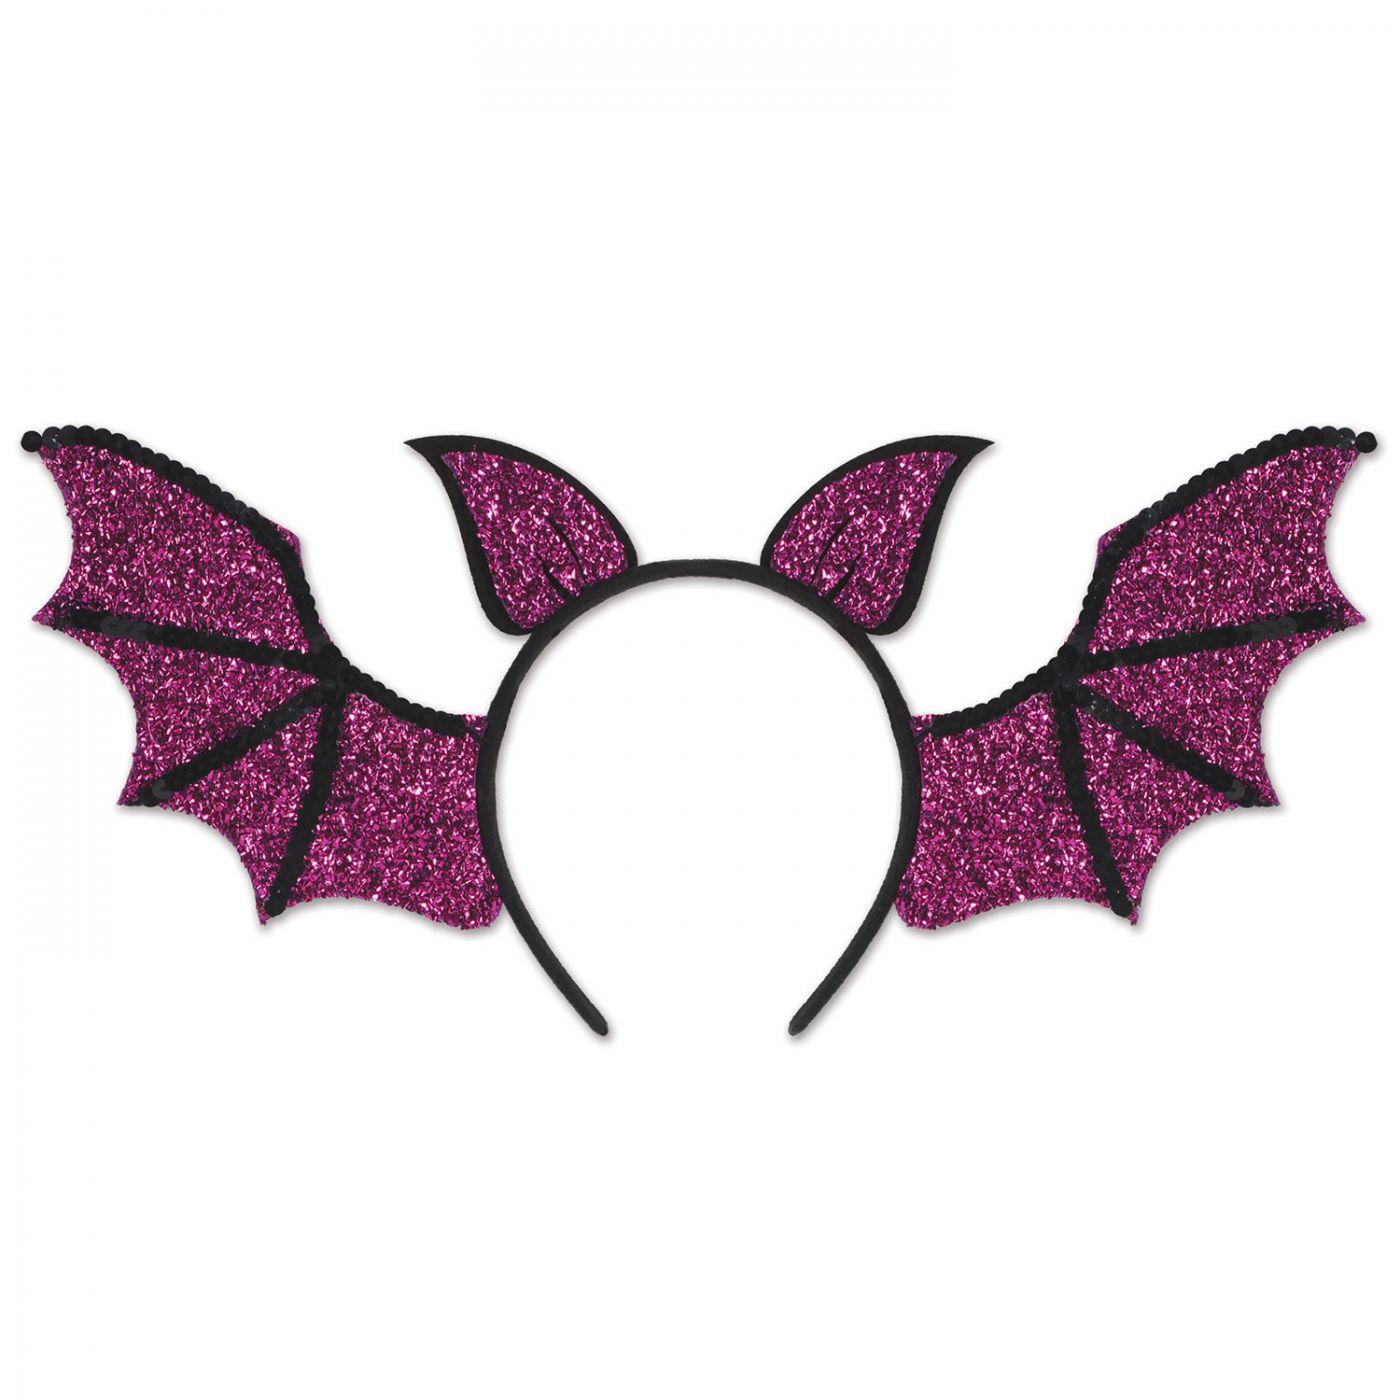 Sequined Bat Wings Headband image